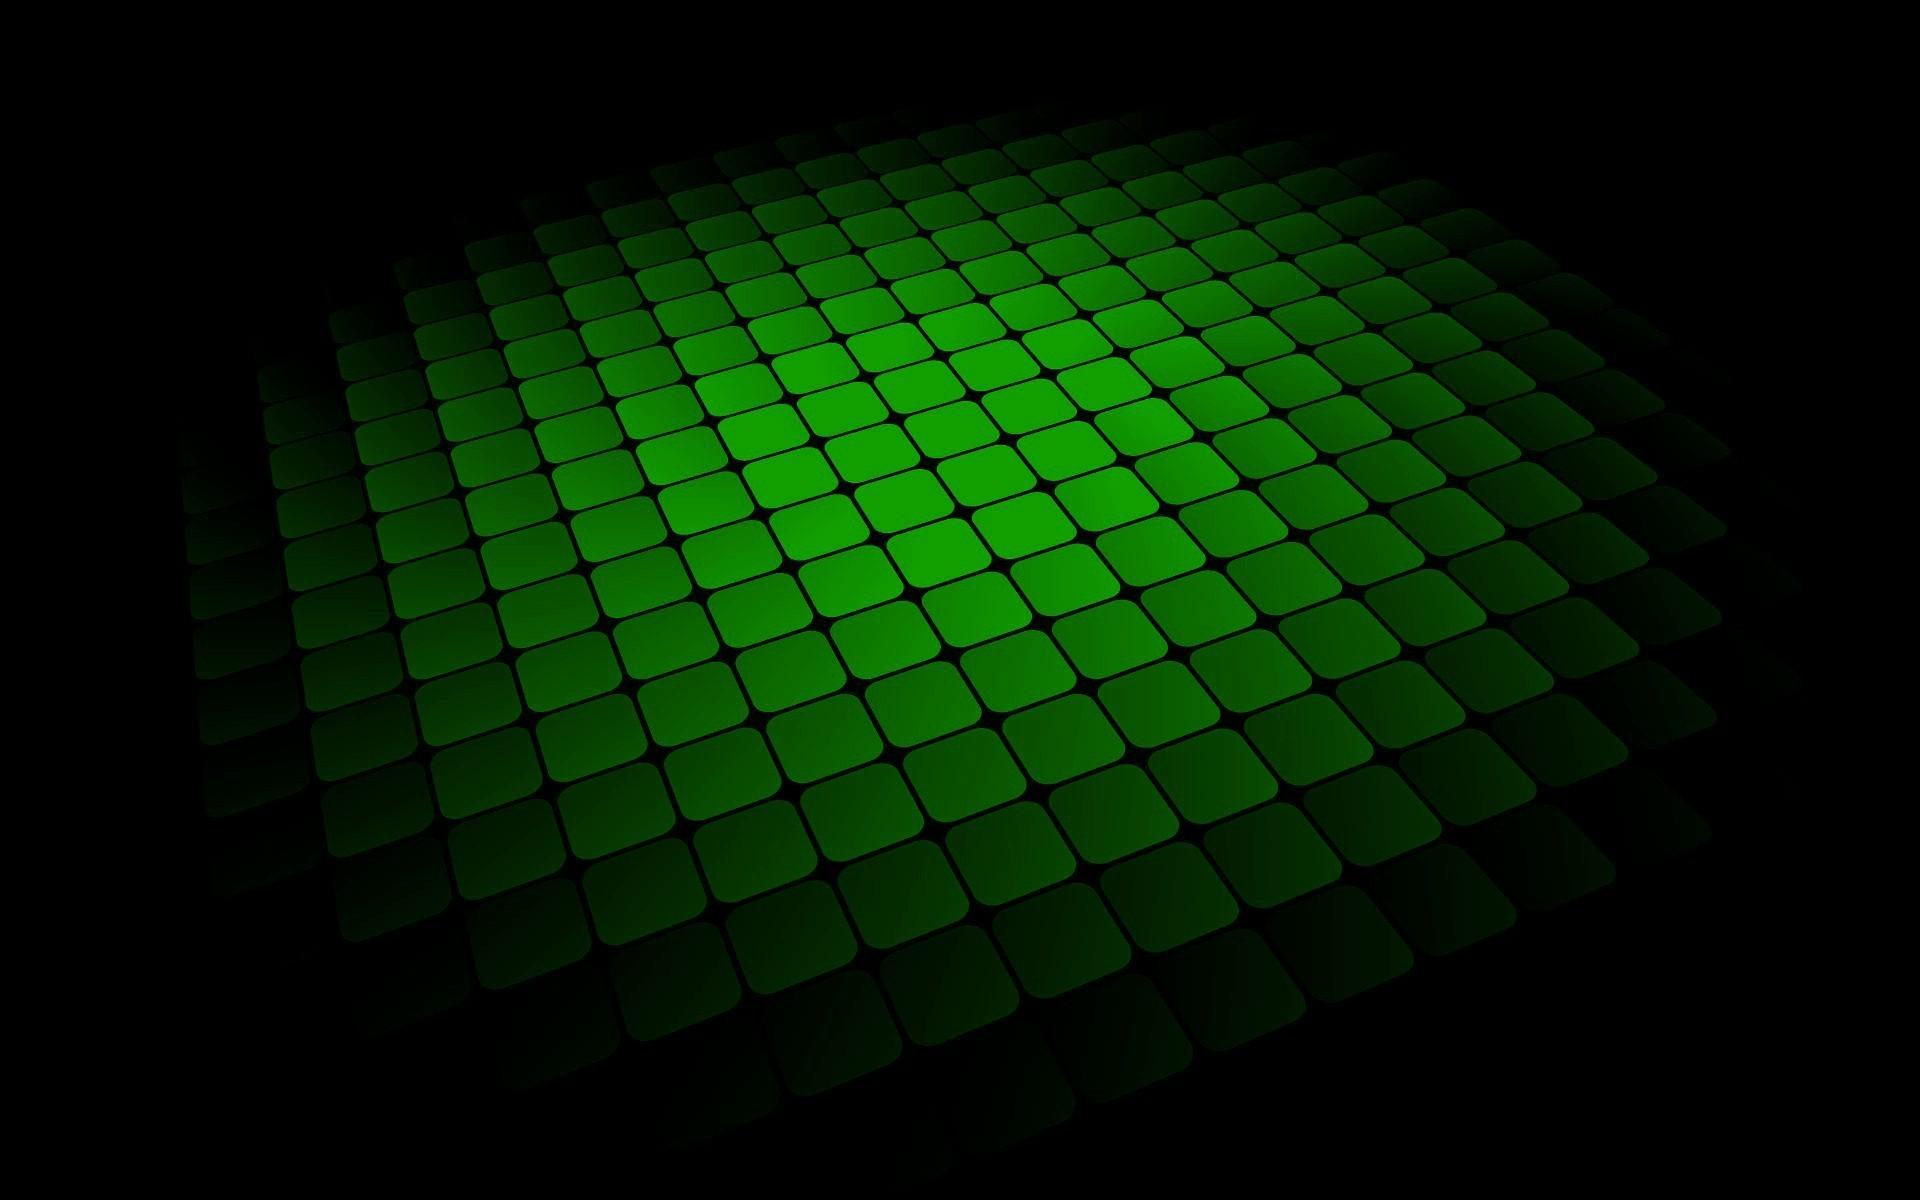 Green Wallpapers Full HD wallpaper search